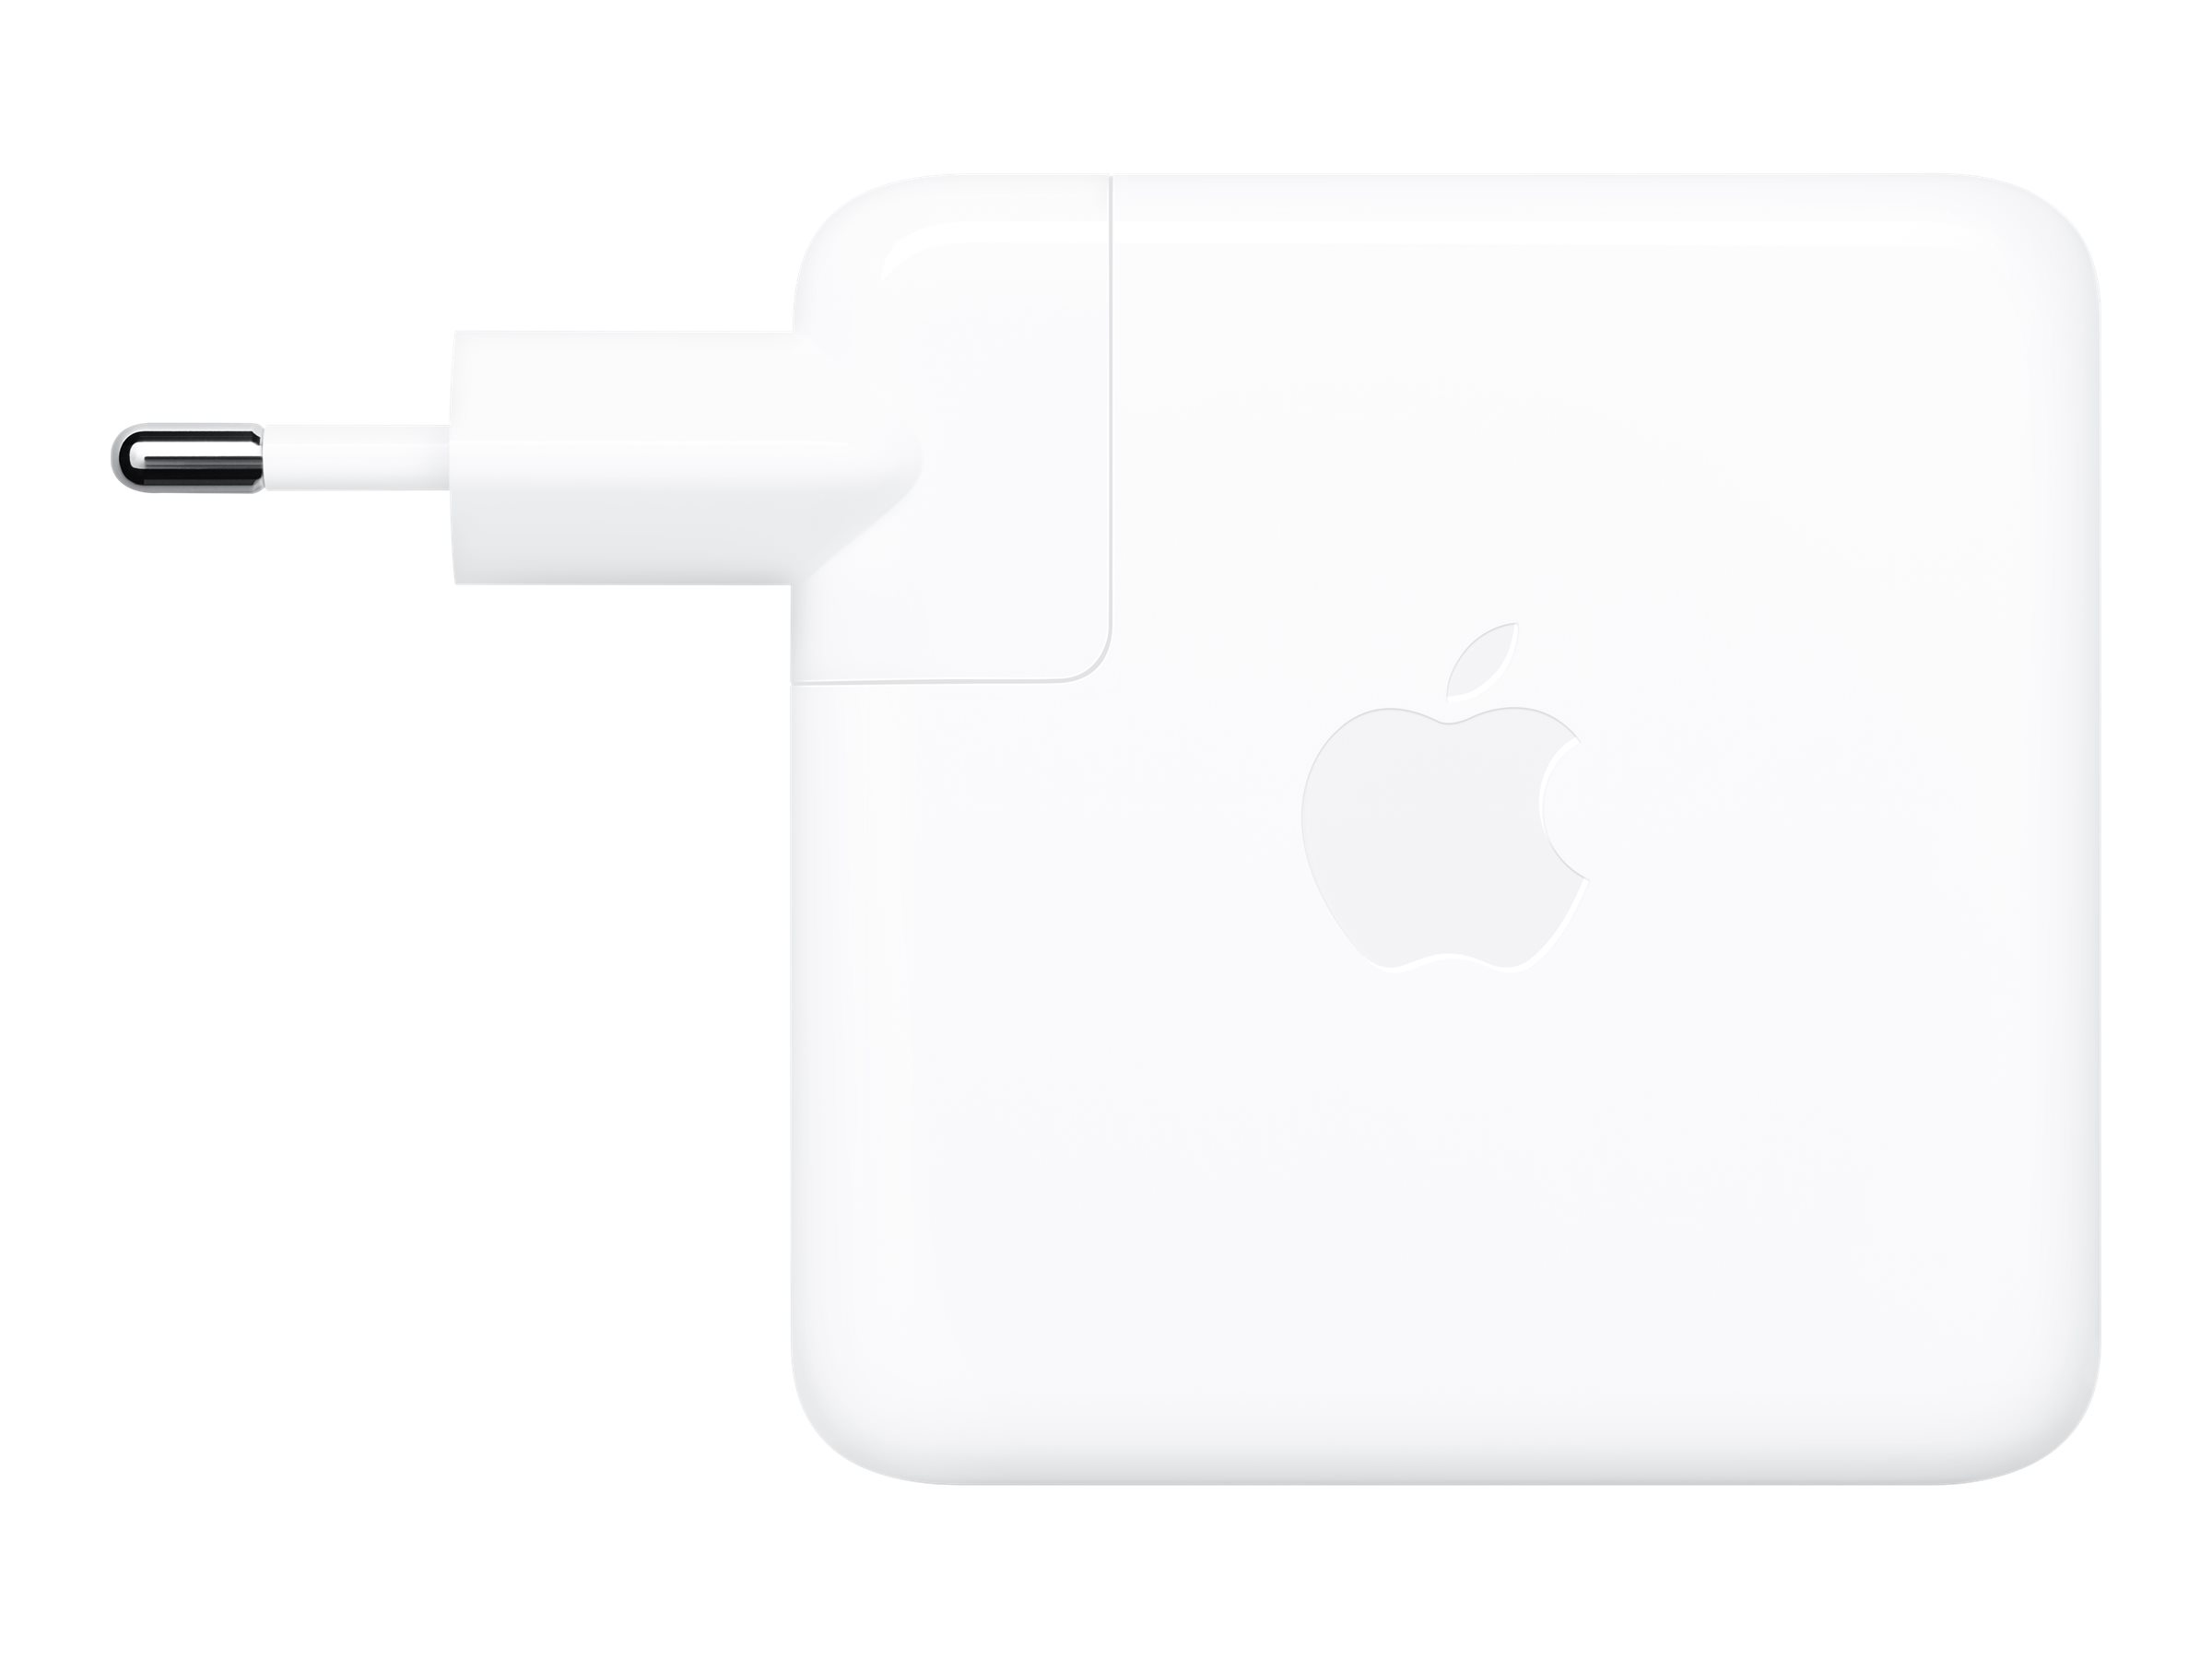 Apple USB-C - Netzteil - 61 Watt - für MacBook (Early 2015, Early 2016, Mid 2017)